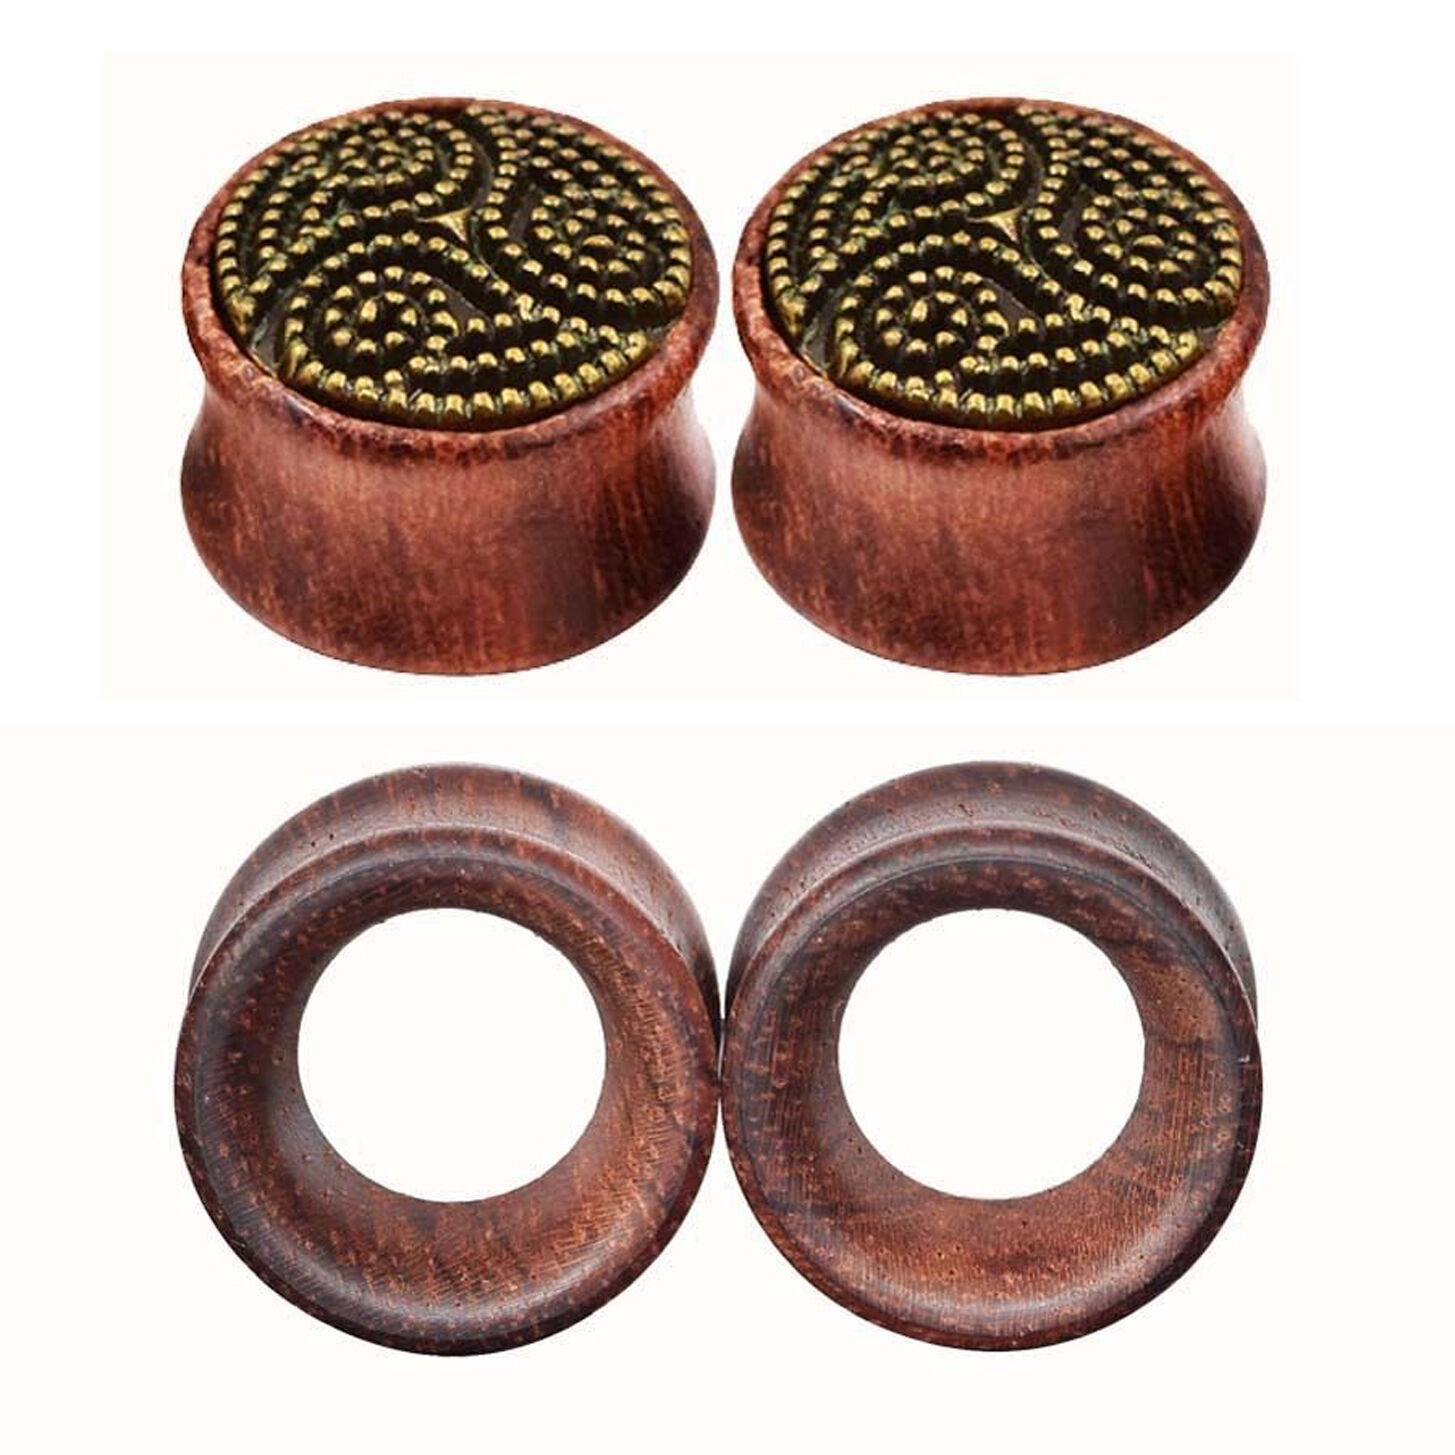 0 3//32-1 3//16in Plug Flesh Tunnel Wood Double Flared Organic Brown Black Horn